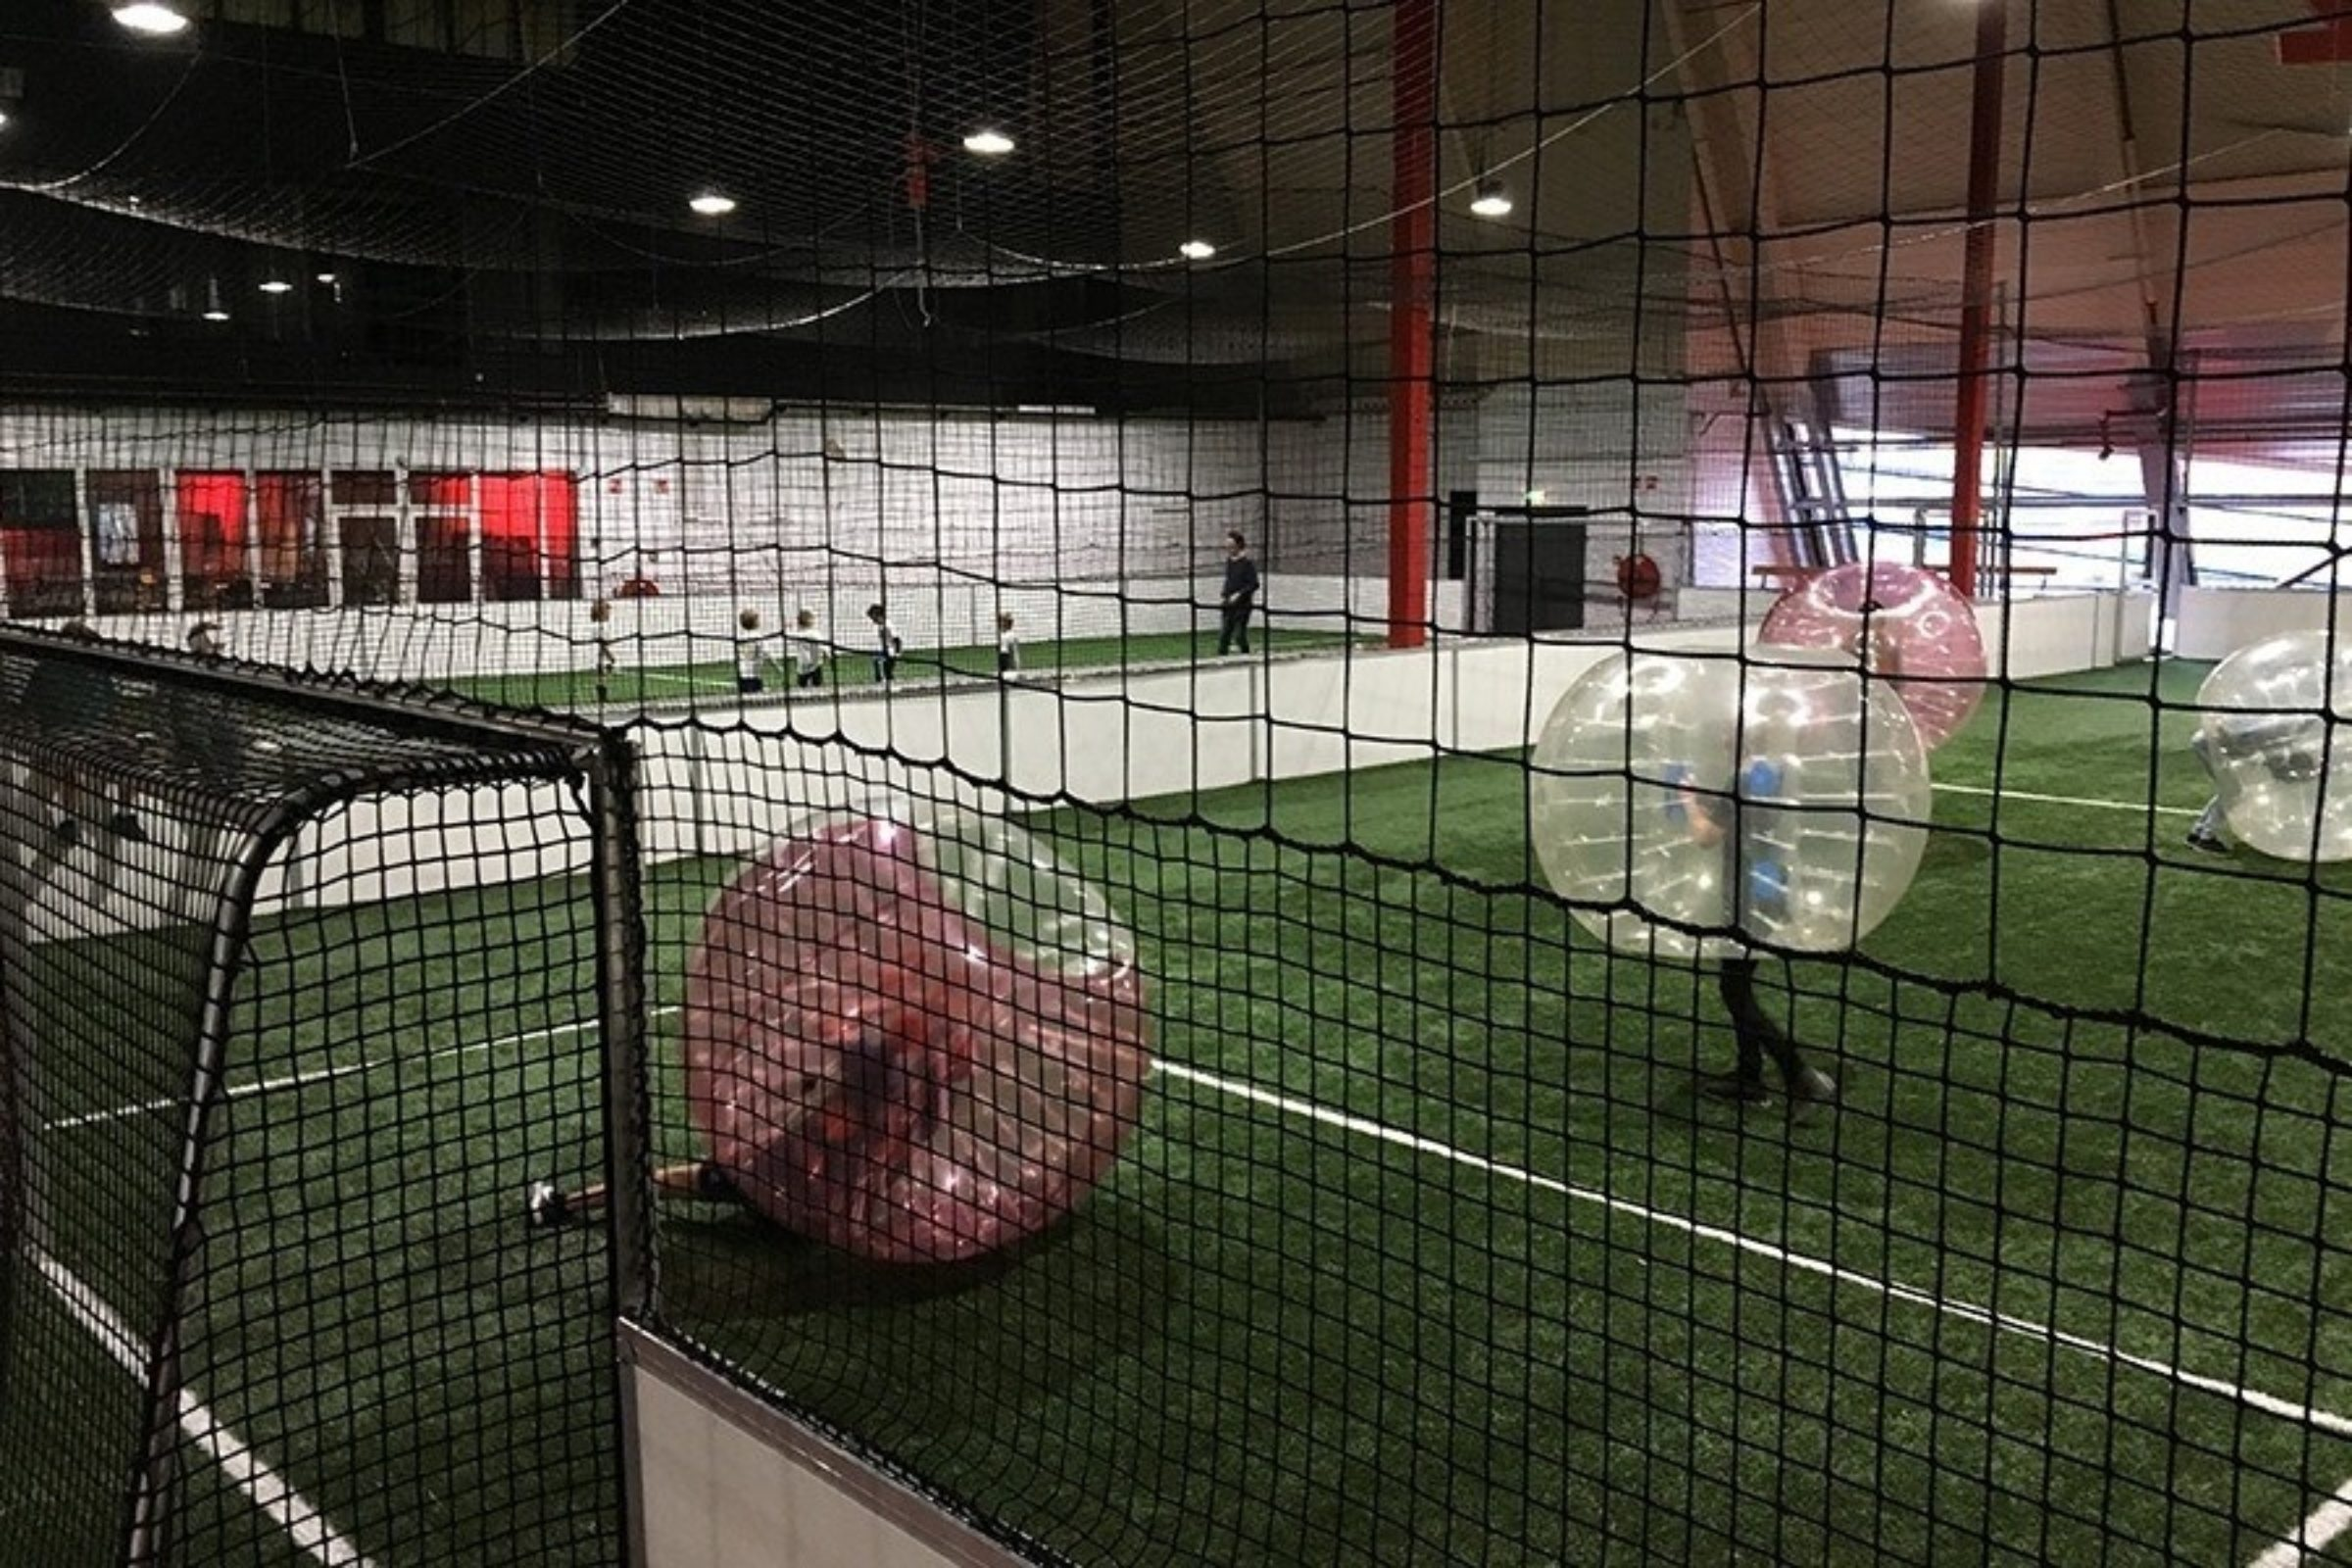 Soccerinside bubblevoetbal bubble voetbal soccer team 1 1028 1530888917 35hszhmolr